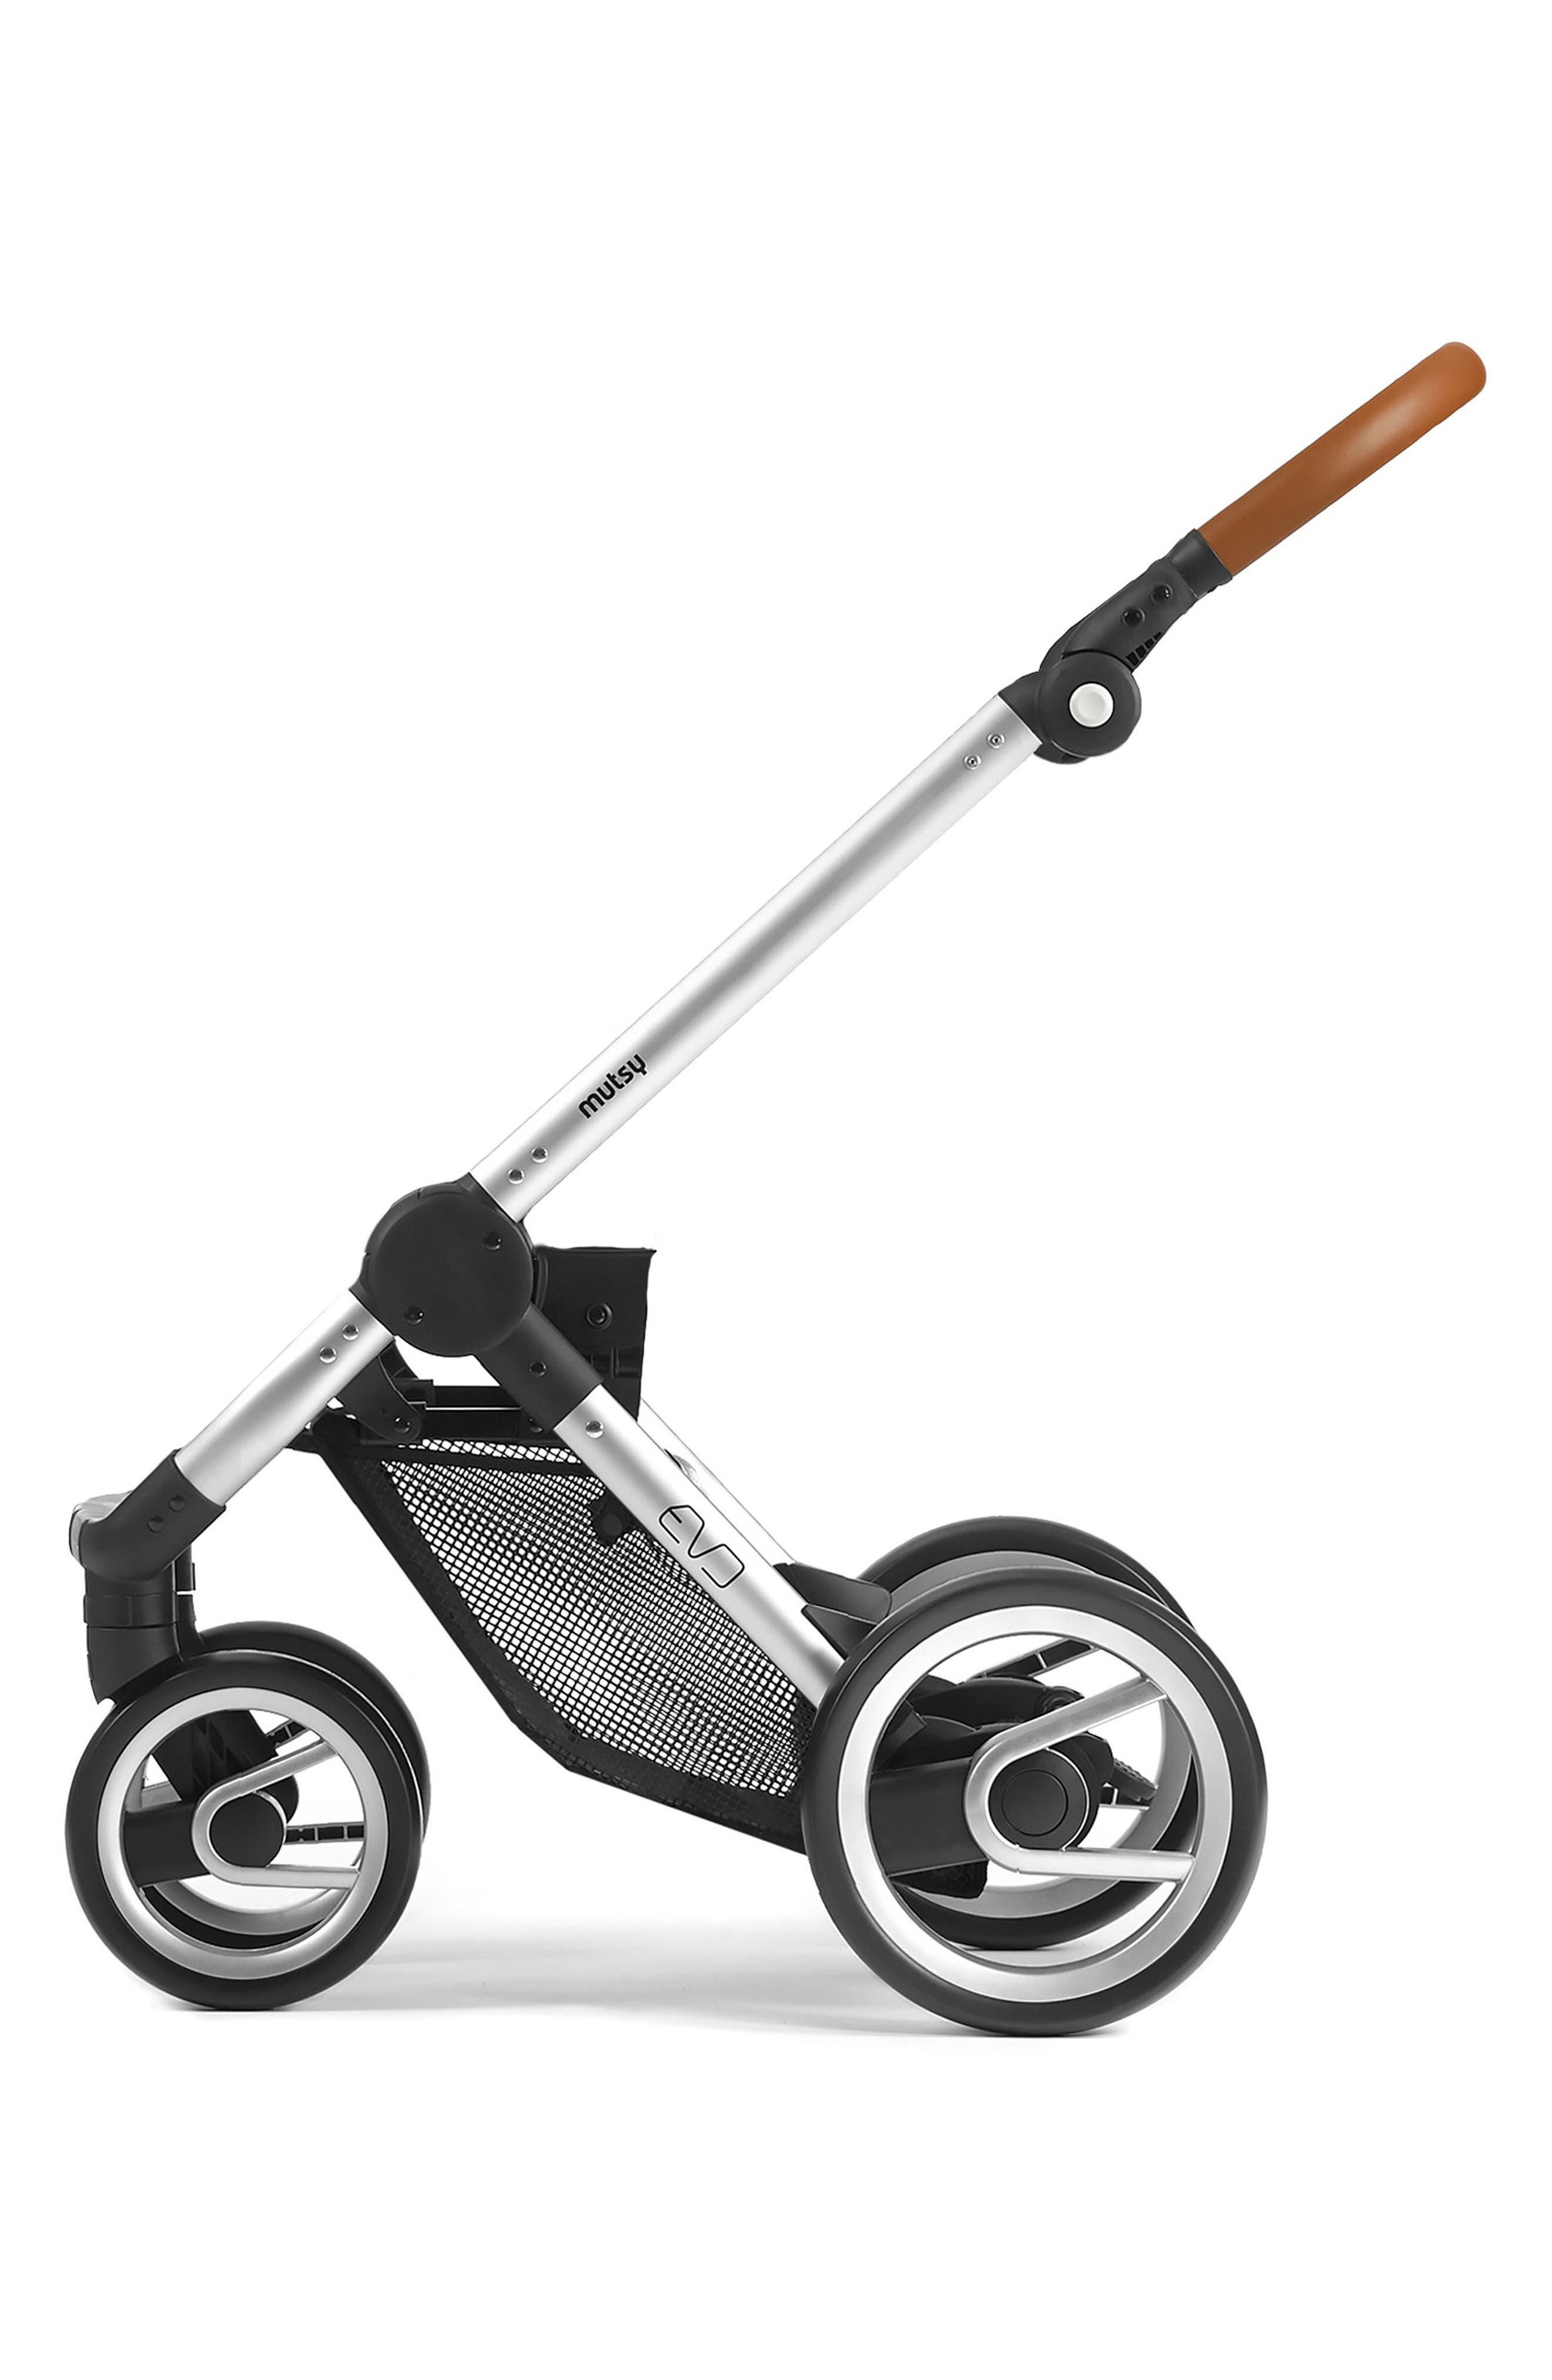 Evo - Urban Nomad Stroller,                             Alternate thumbnail 2, color,                             Silver/ Blue